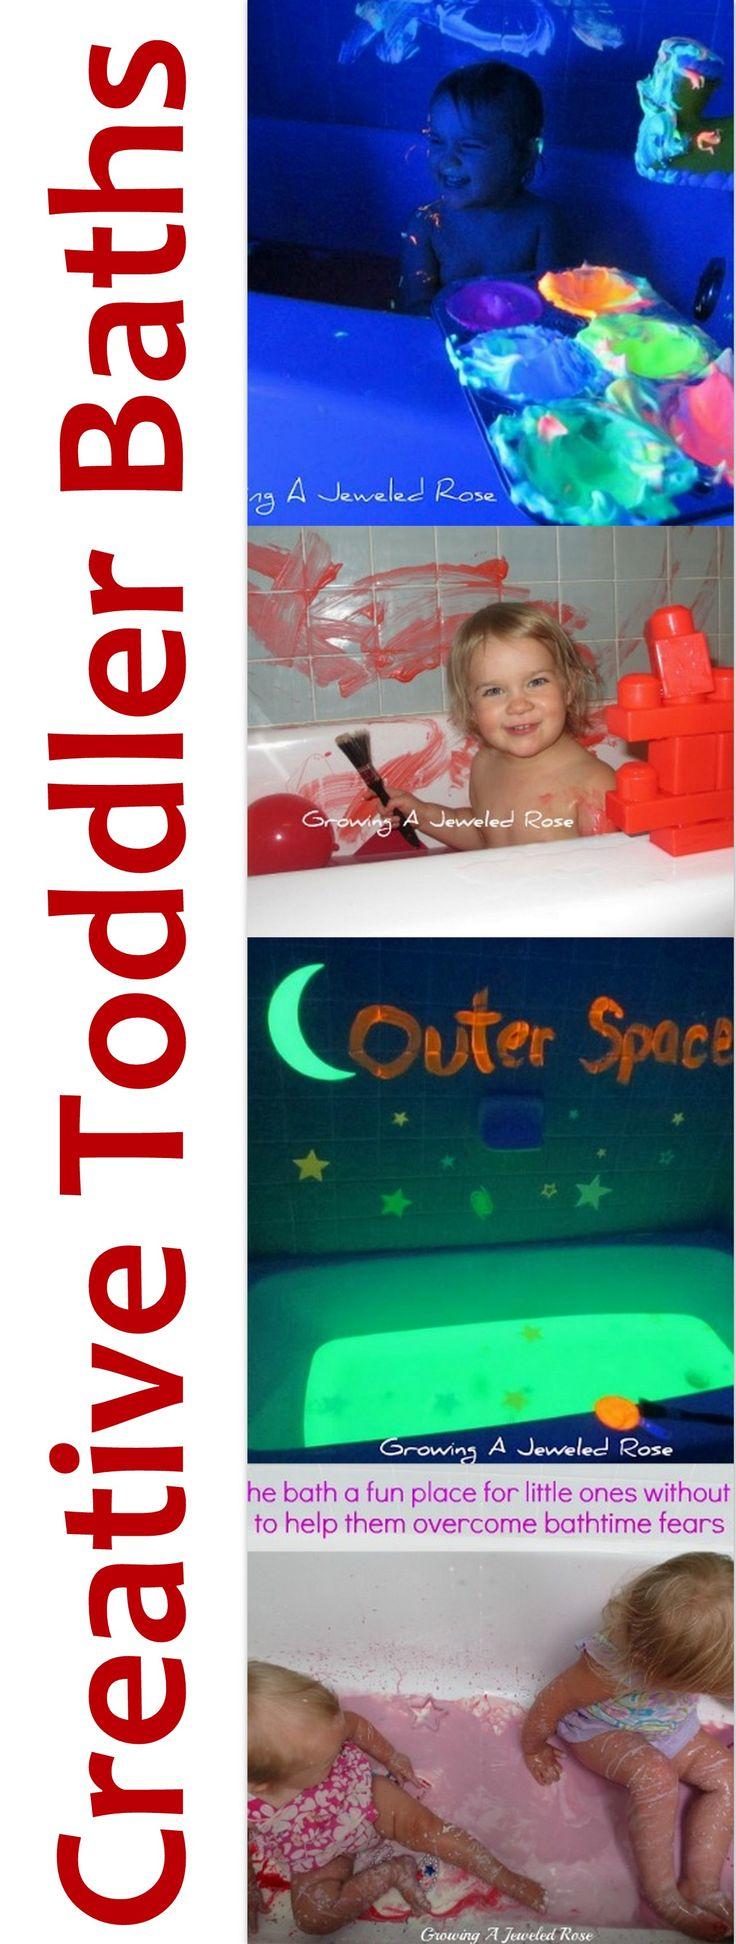 Creative toddler bath ideas: Coolest Ideas, Glow In The Dark Bath Water, Creative Toddlers, Bathtim Plays, Creative Bathtim, Glow In The Dark Water Ideas, Plays Ideas, Bath Ideas, Toddlers Bath